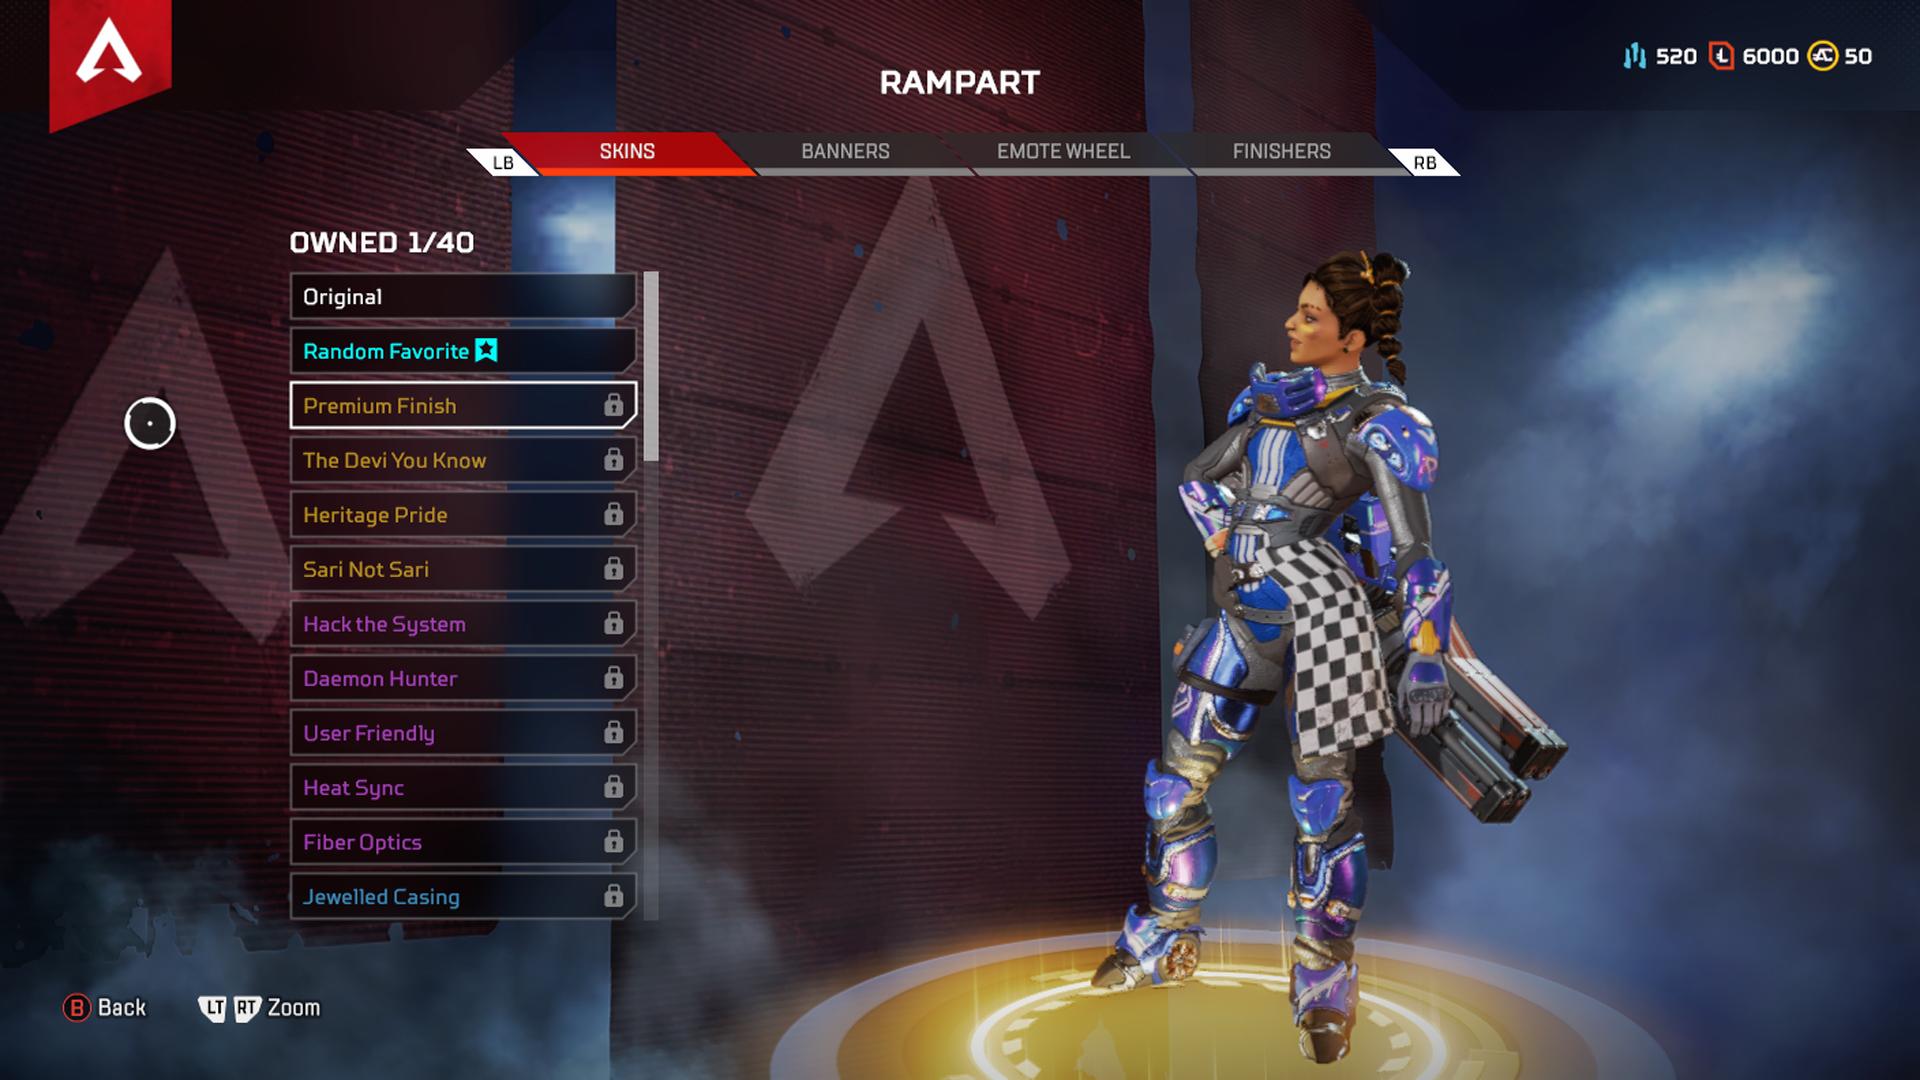 apex legends rampart skins